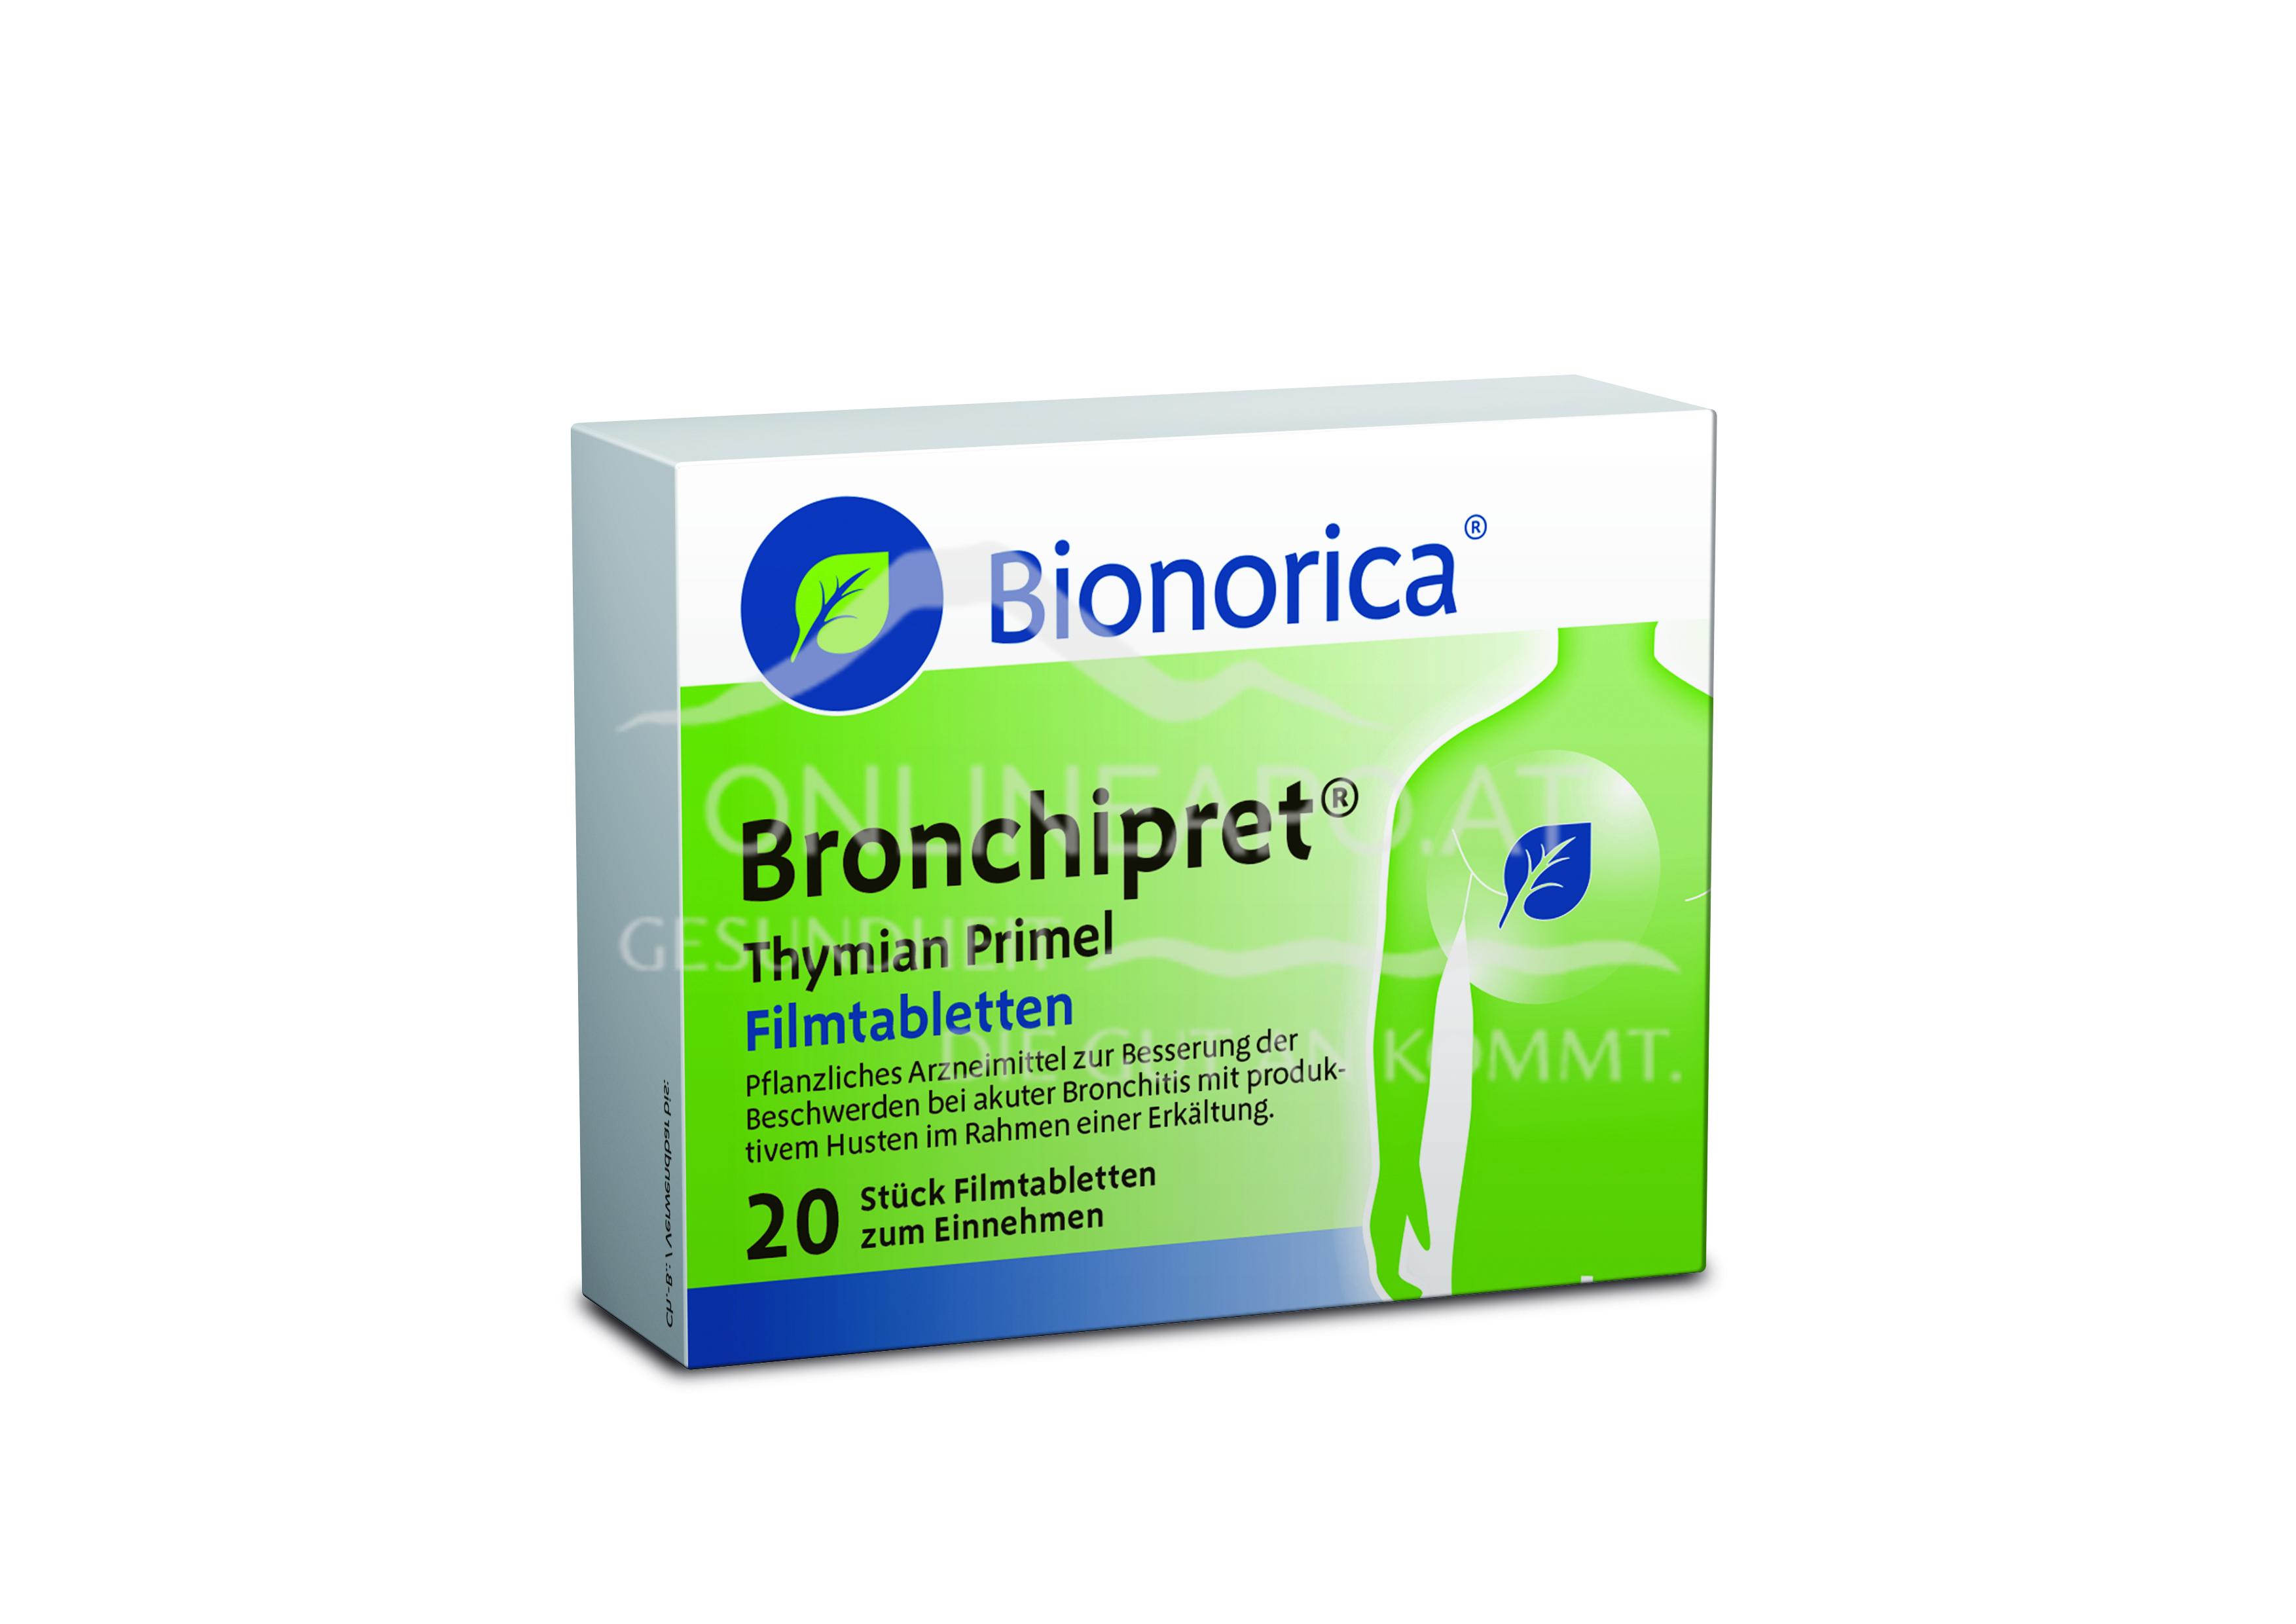 Bronchipret® Filmtabletten